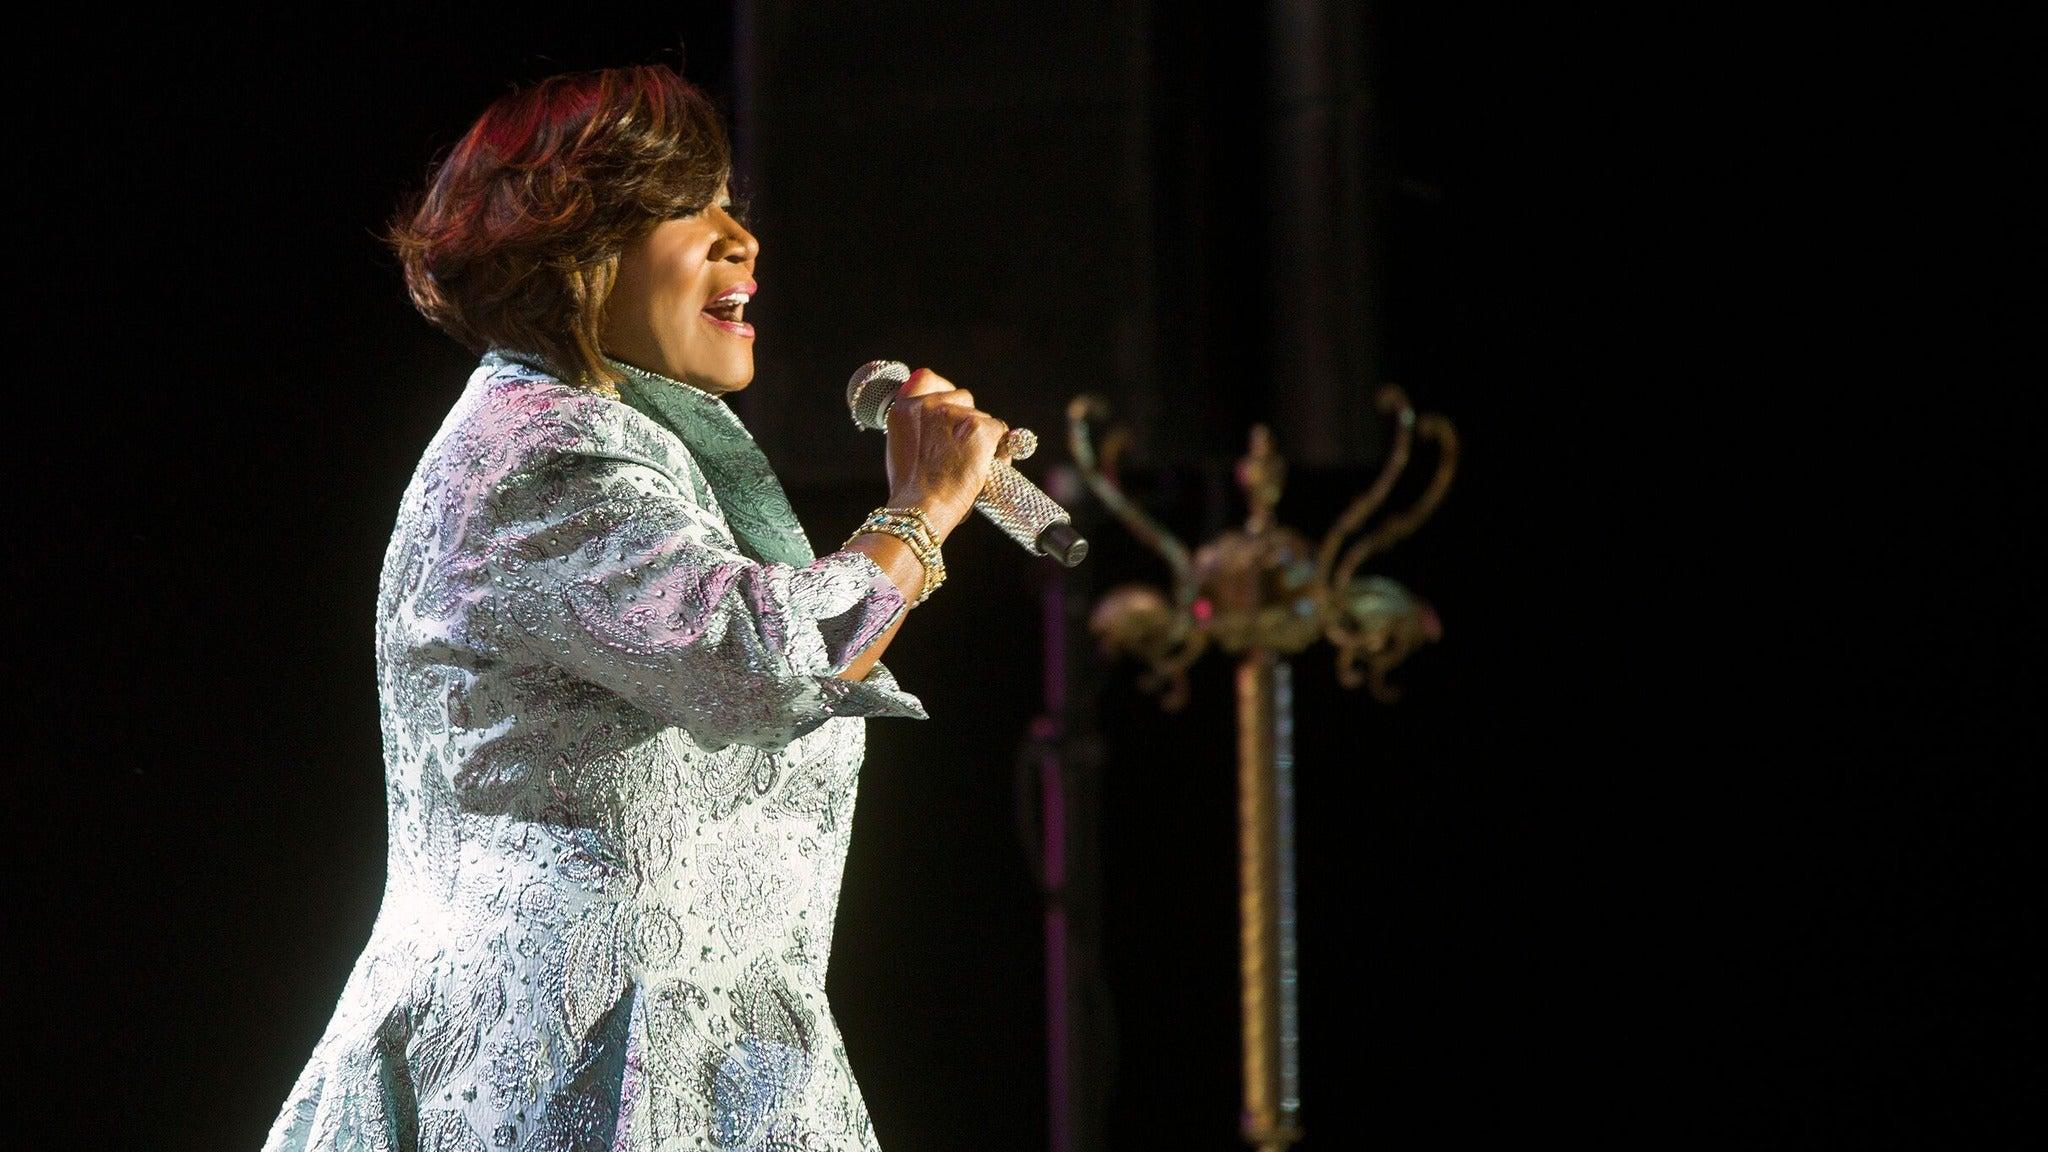 Mike's Fall Soul Celebration presale password for concert tickets in Nashville, TN (Bridgestone Arena)